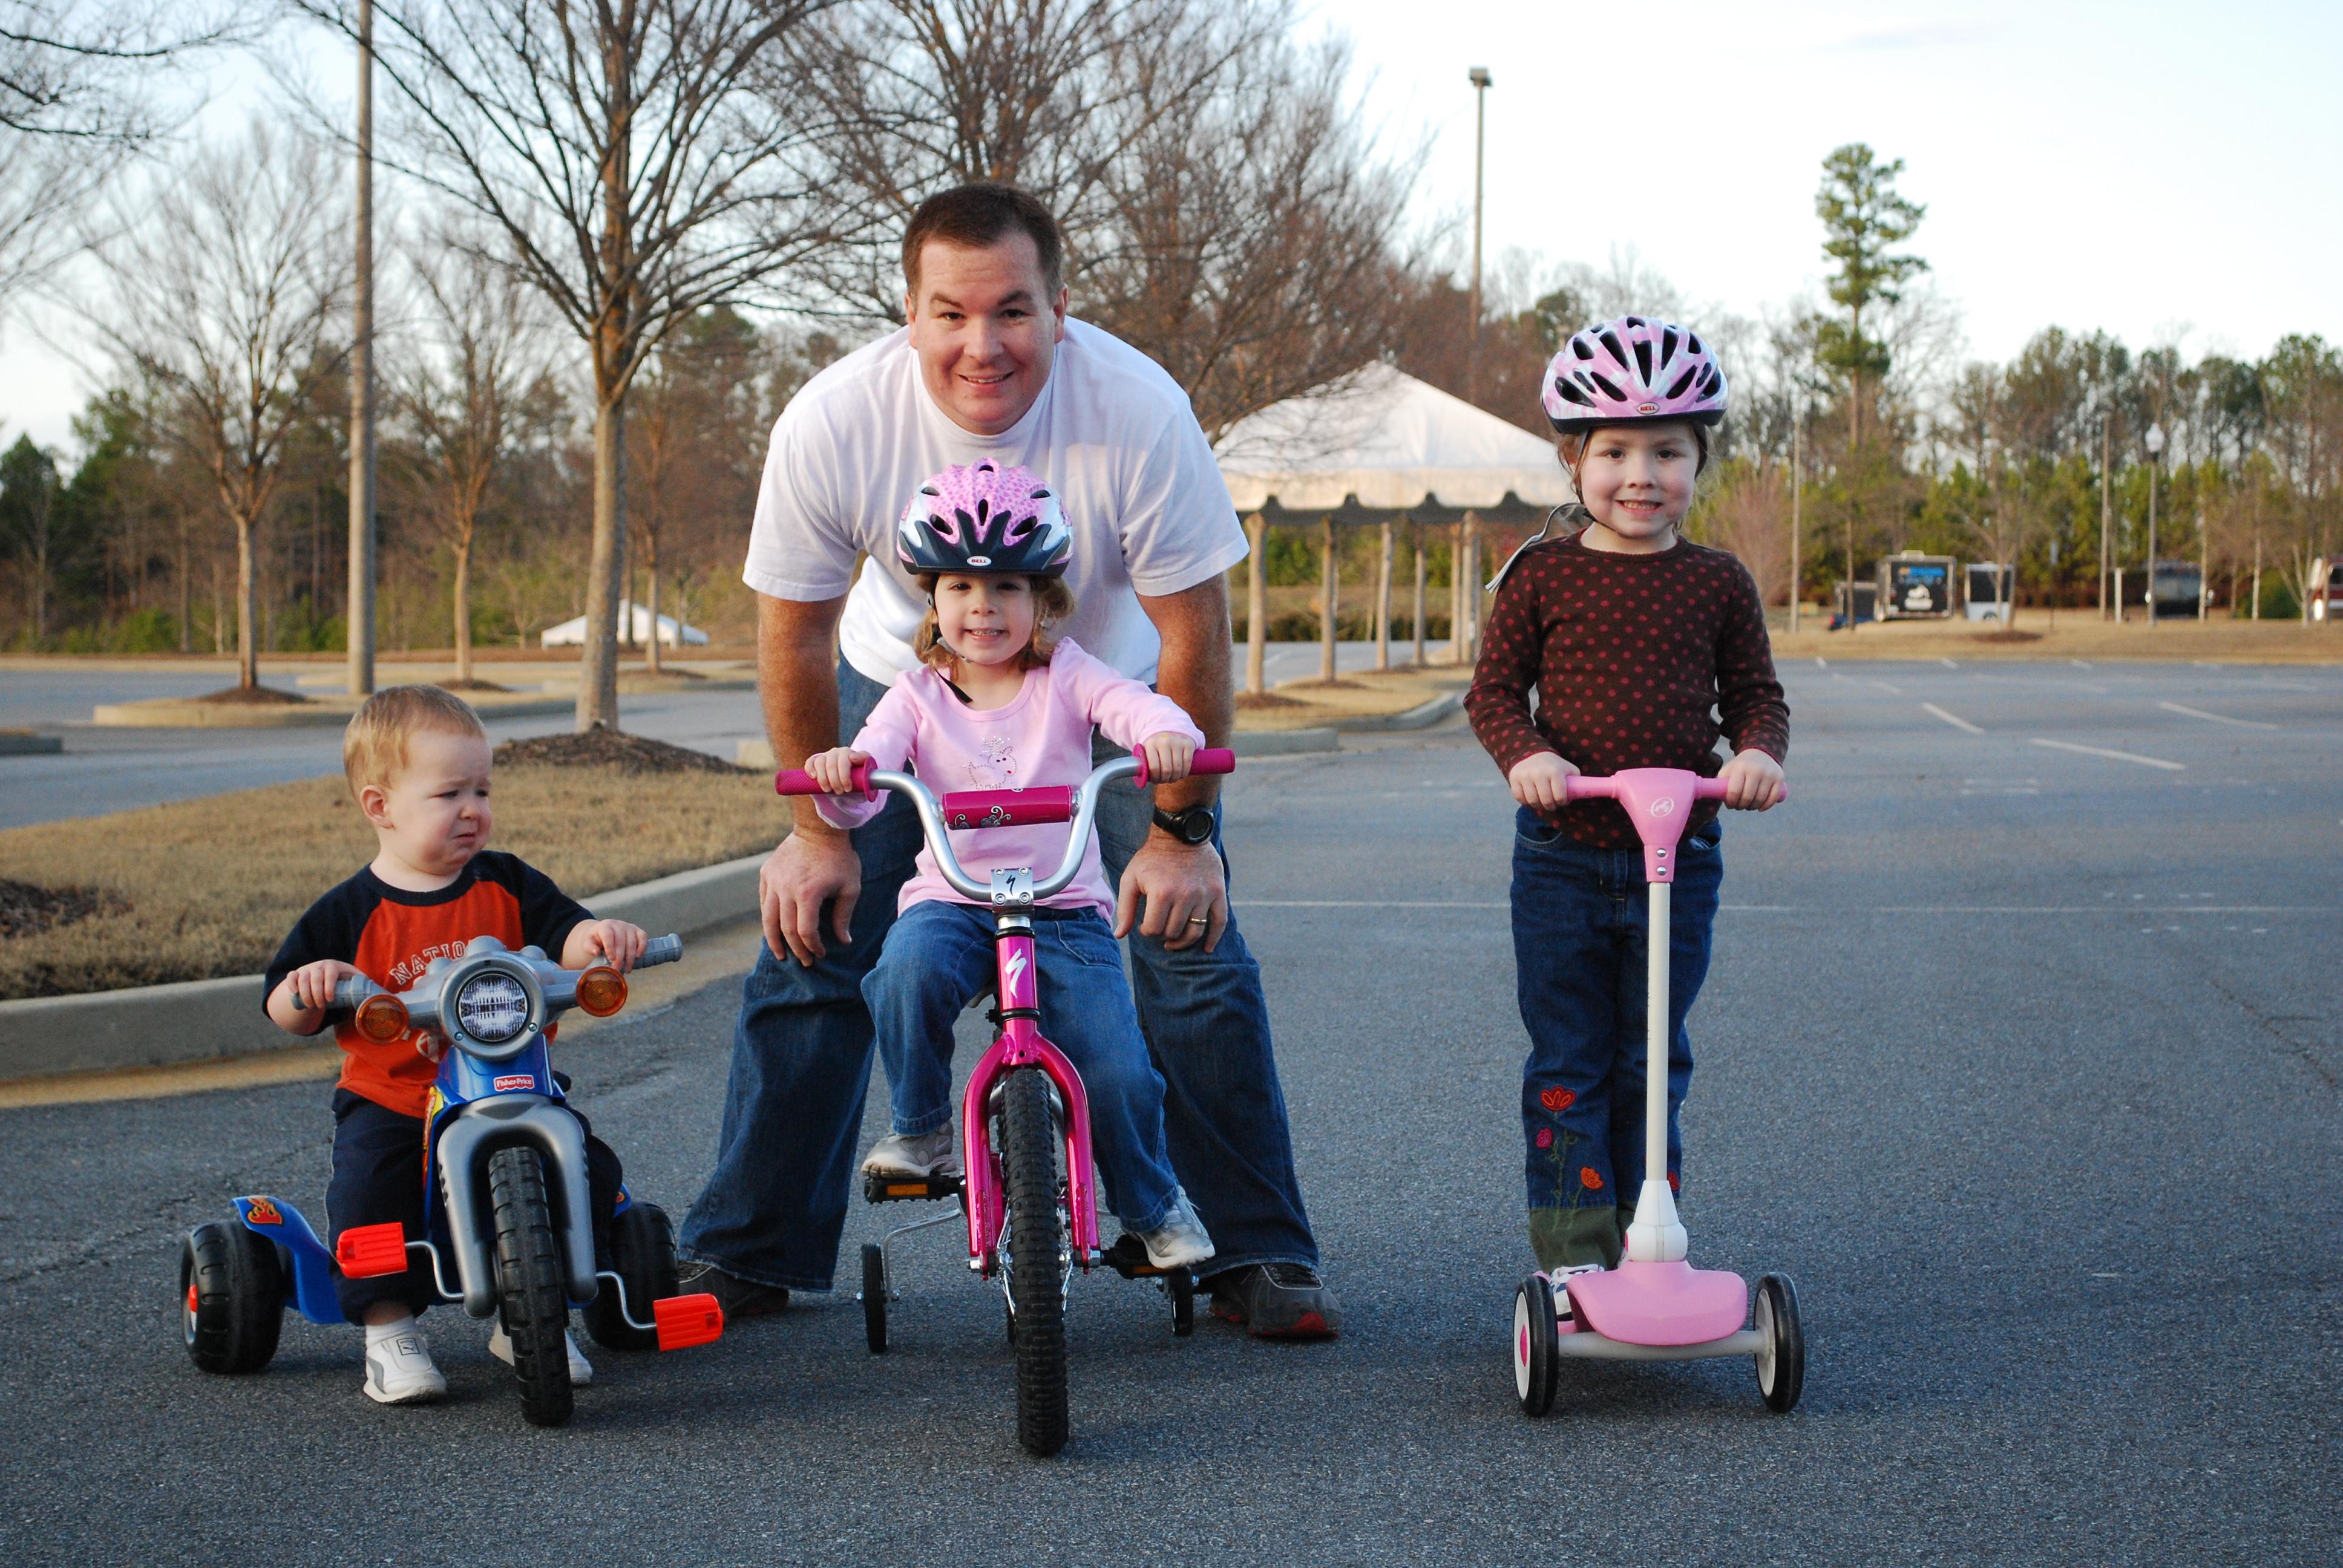 Josh with the bikers